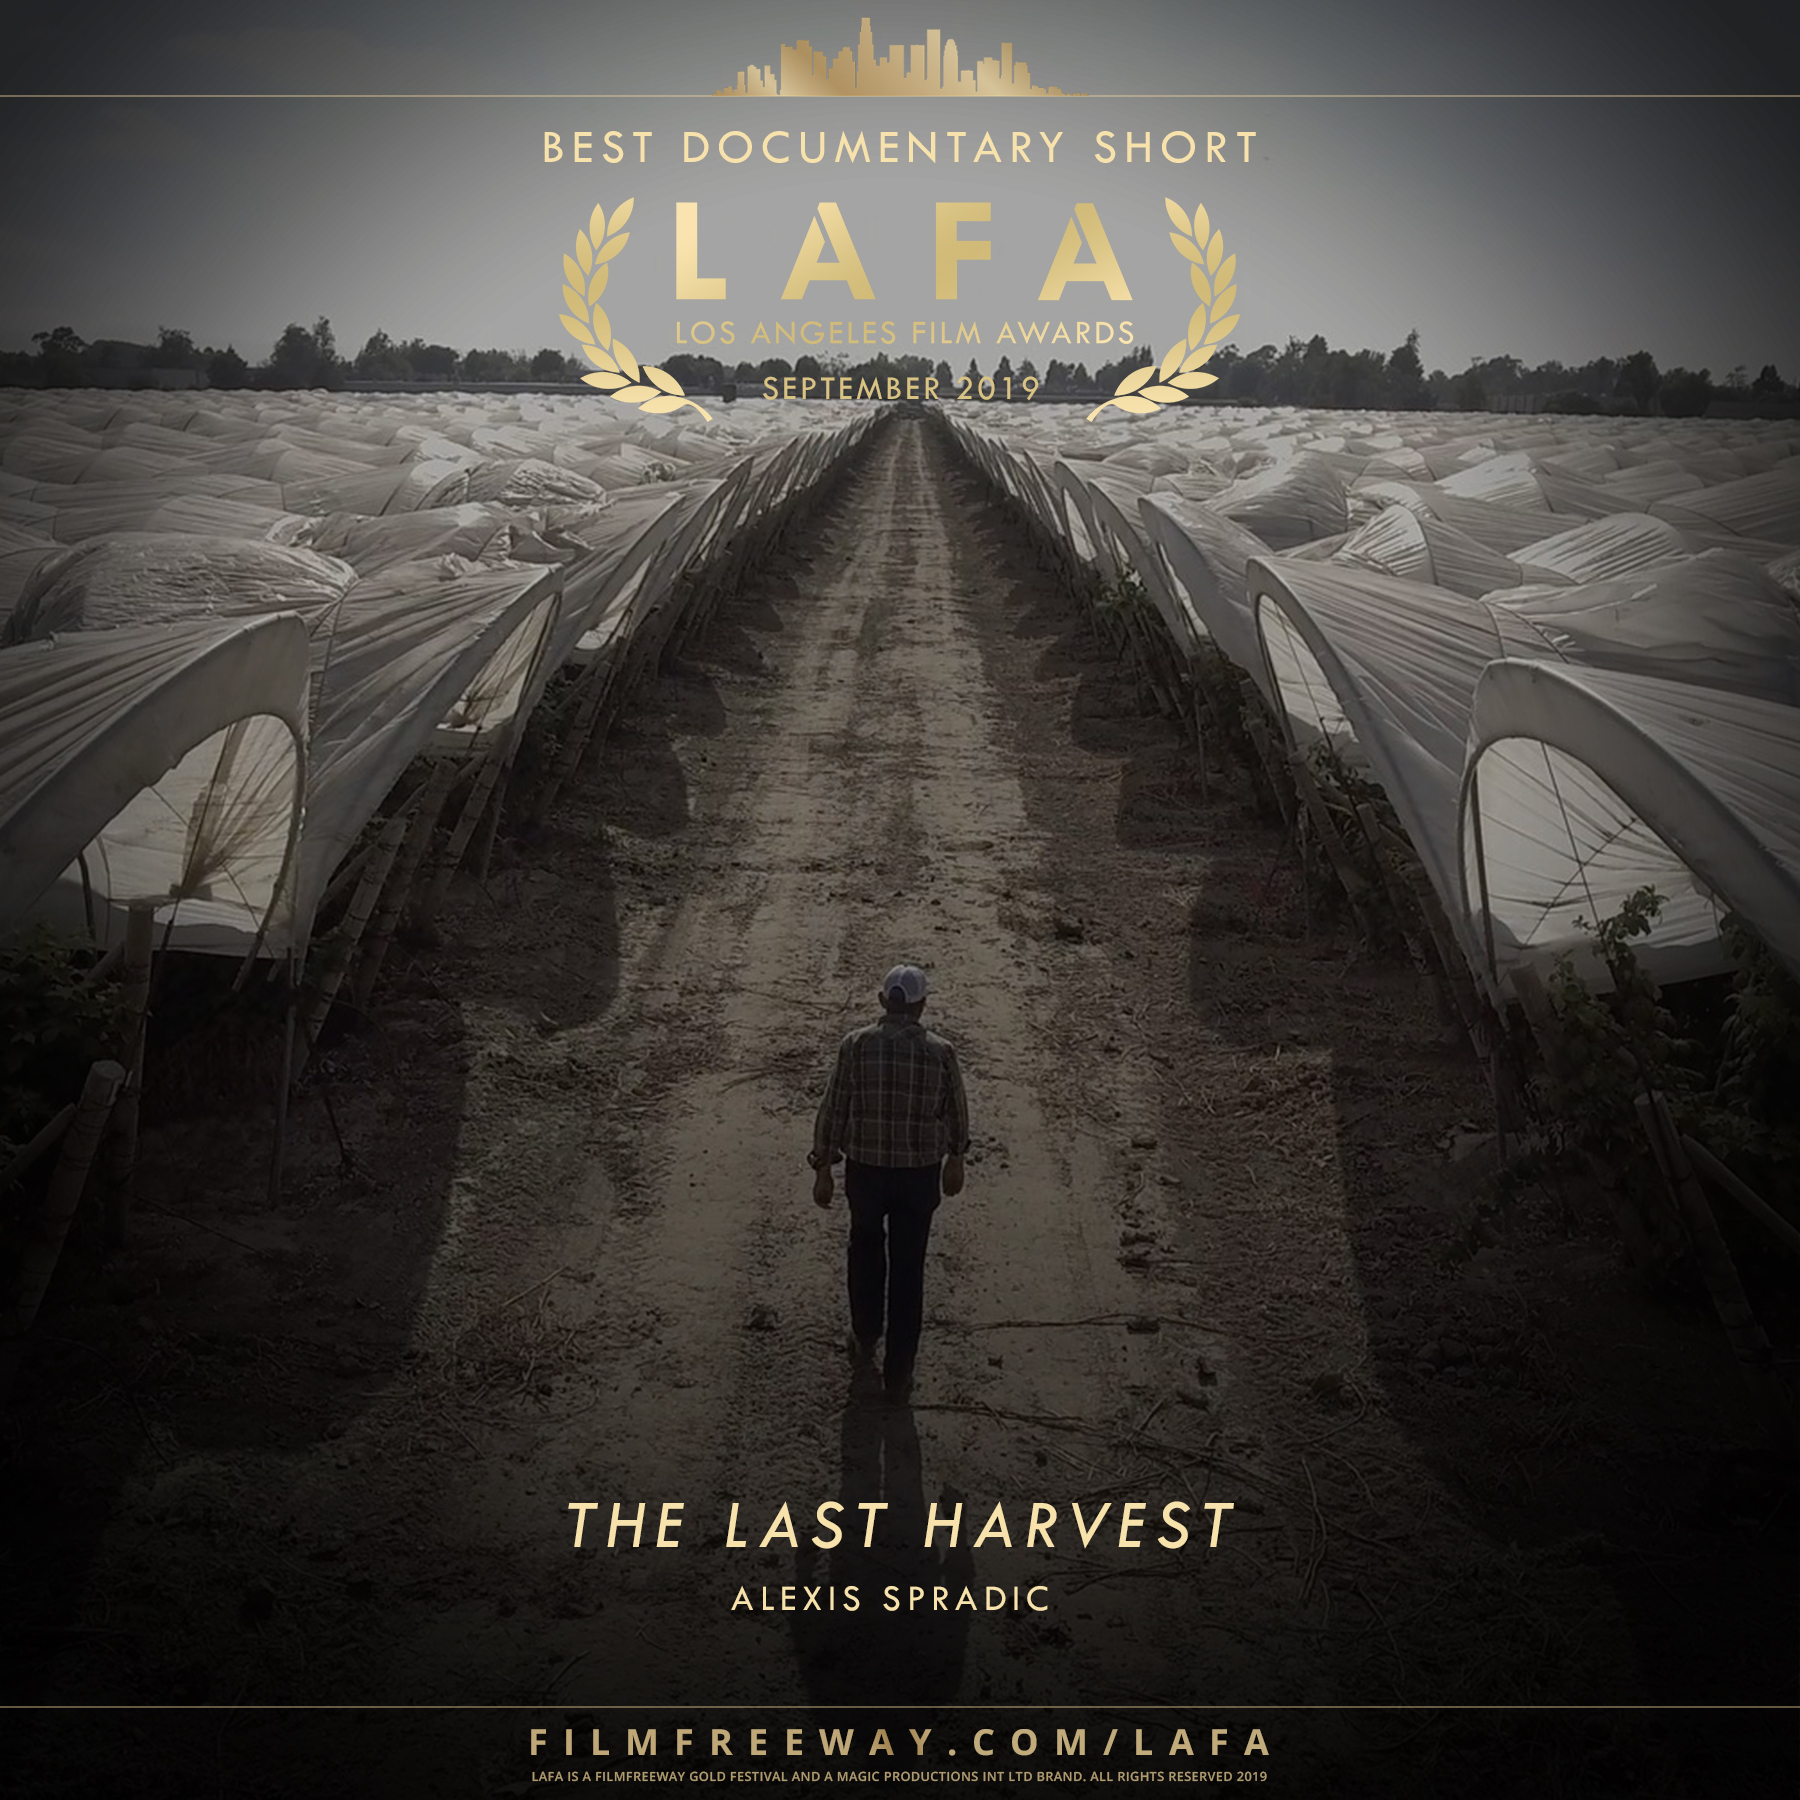 THE LAST HARVEST design